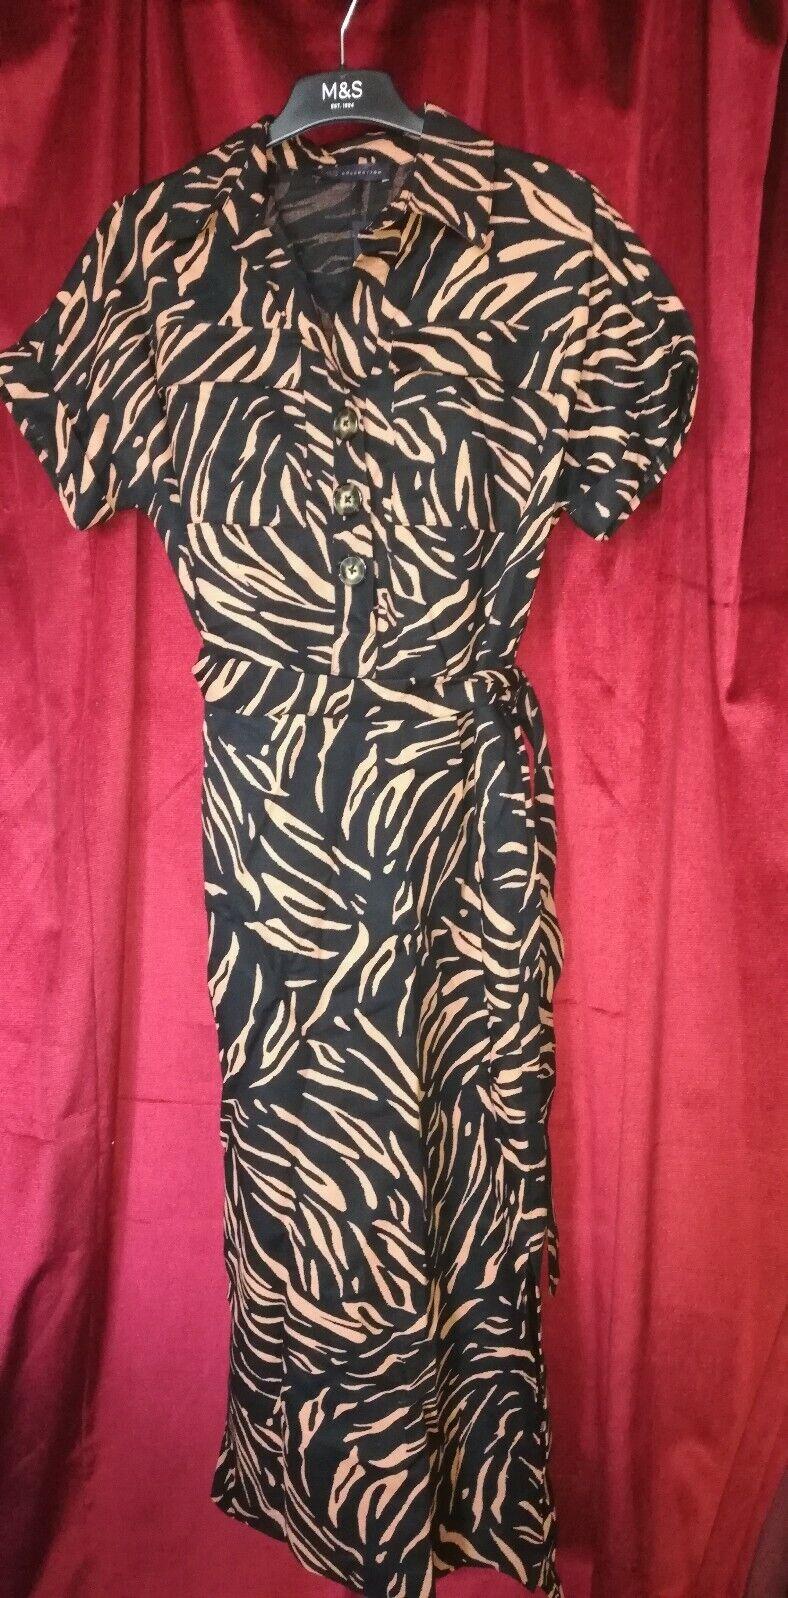 SIZE 8 M&S DRESS LONG ANIMAL PRINT LINEN NWT BLACK TAN SAFARI STYLE ZEBRA BELT